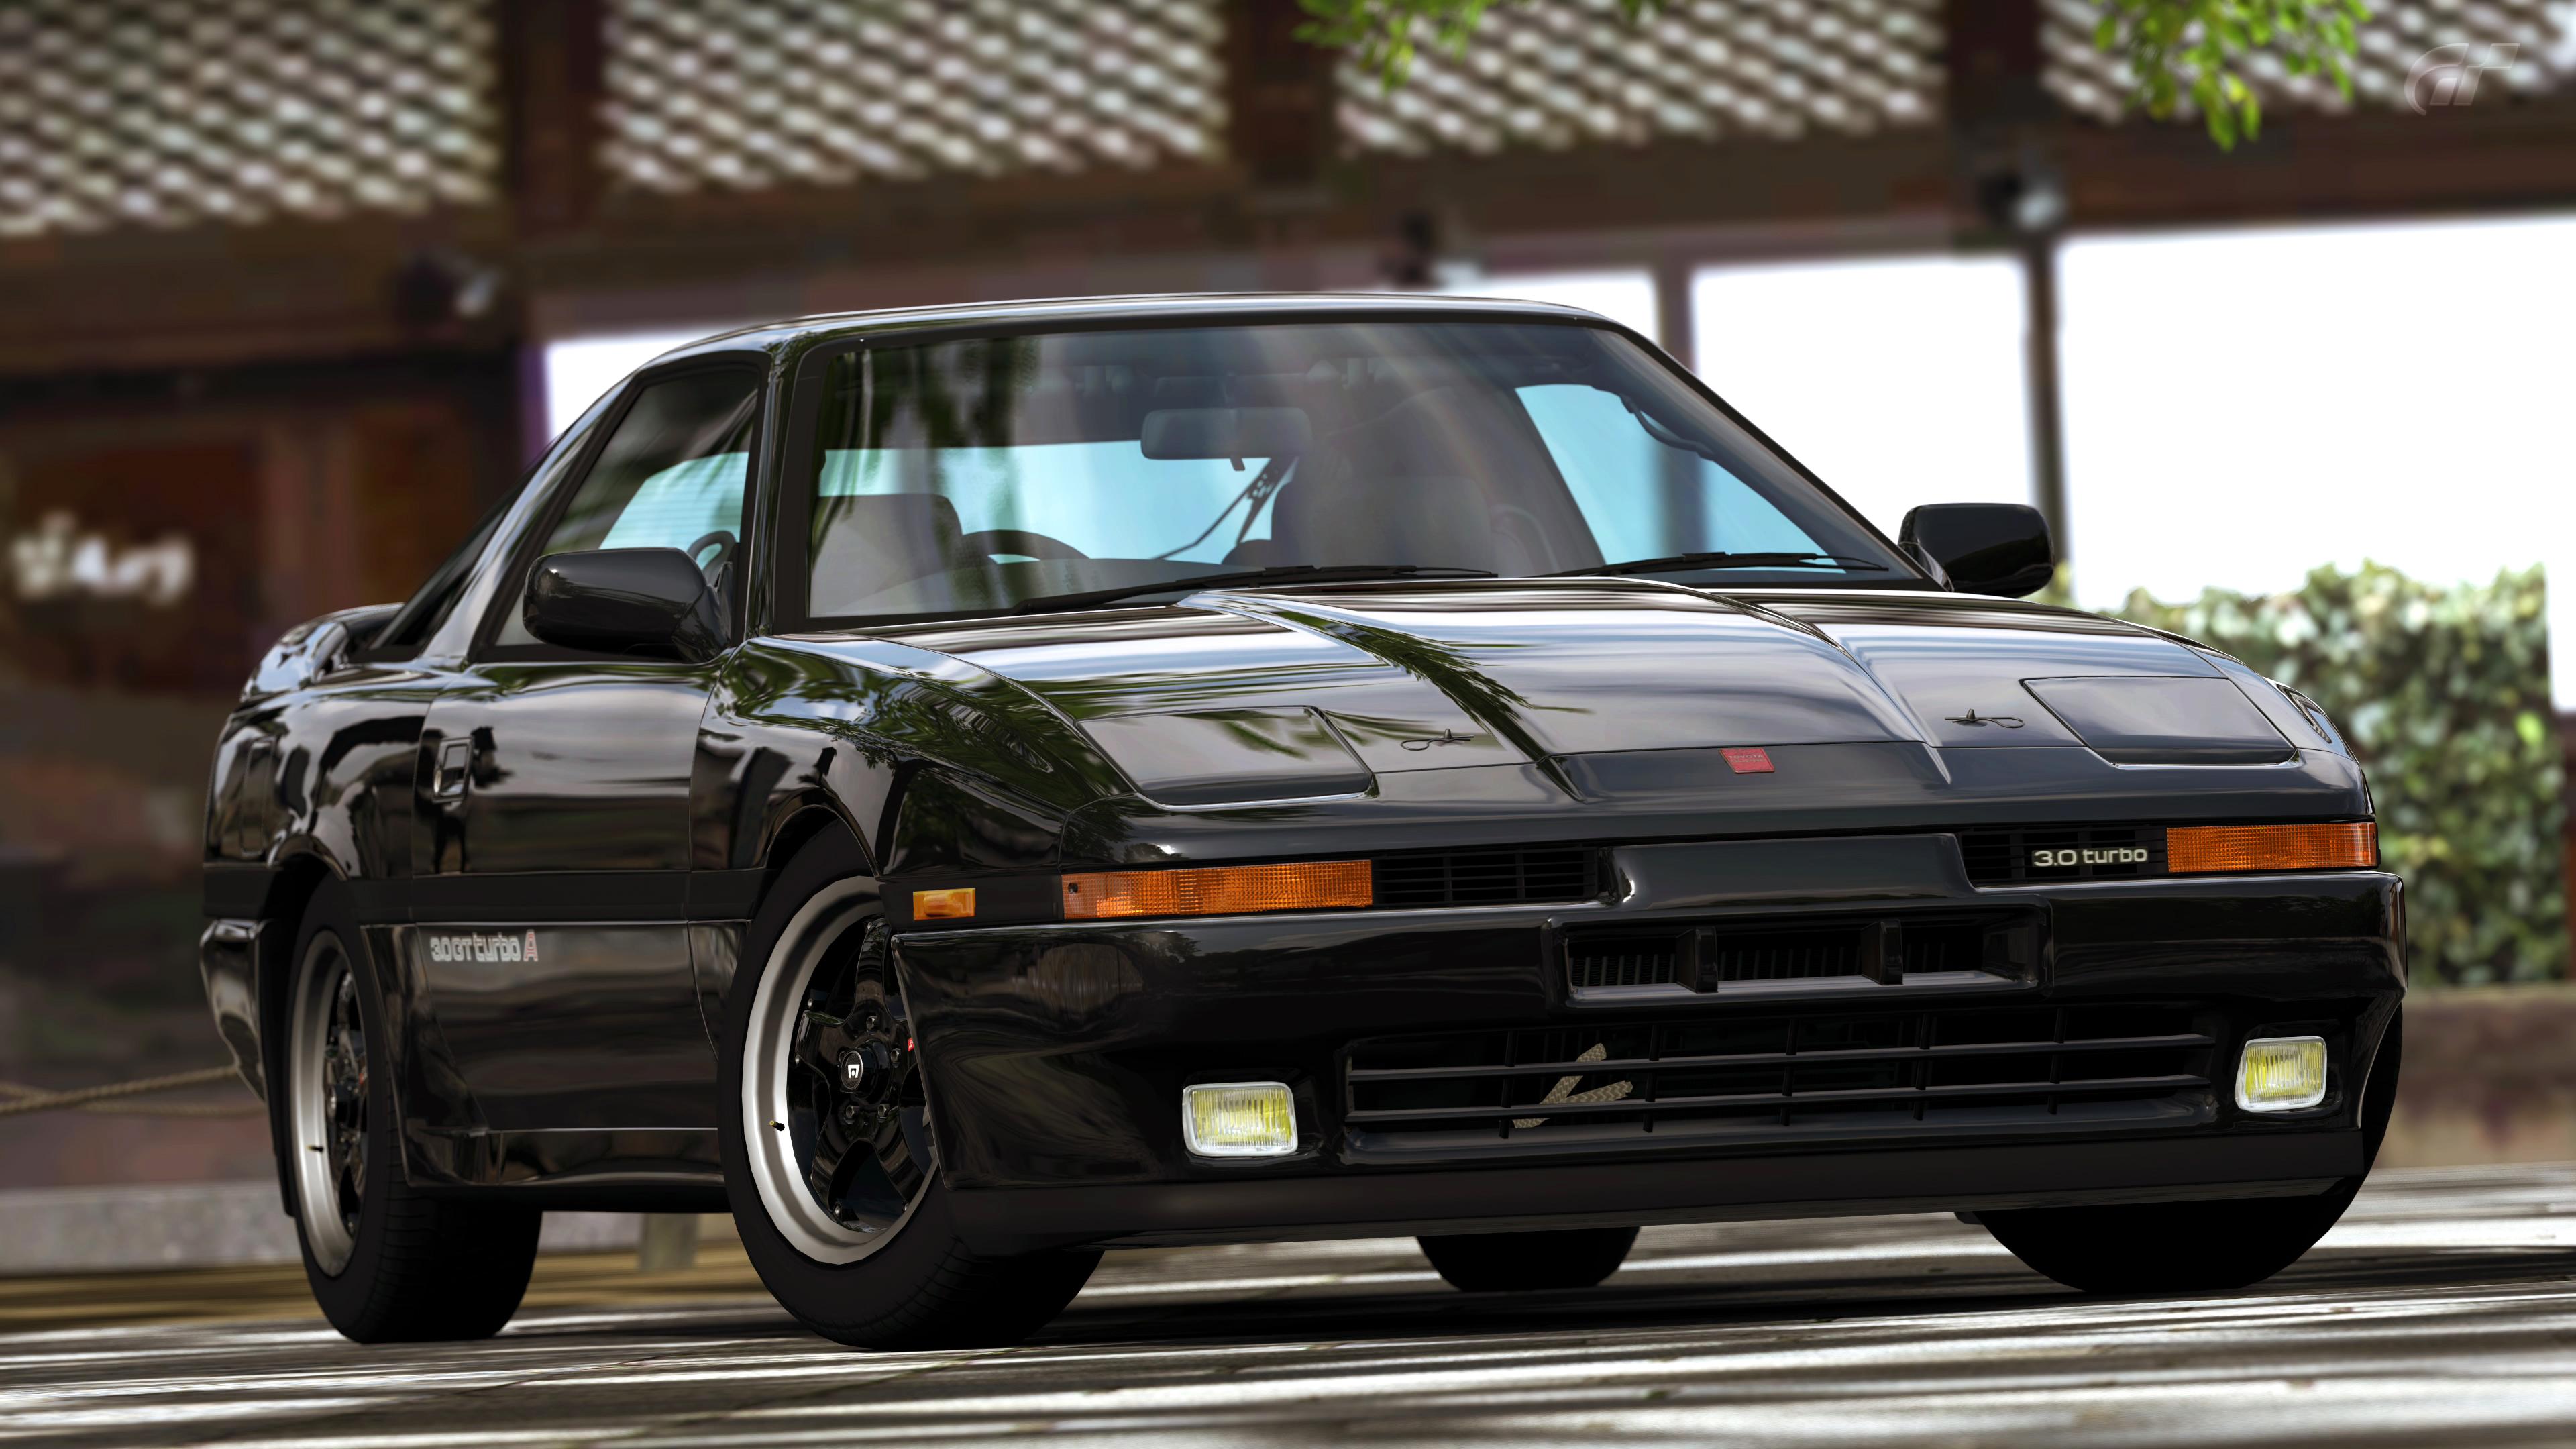 Kelebihan Toyota Supra 1988 Perbandingan Harga